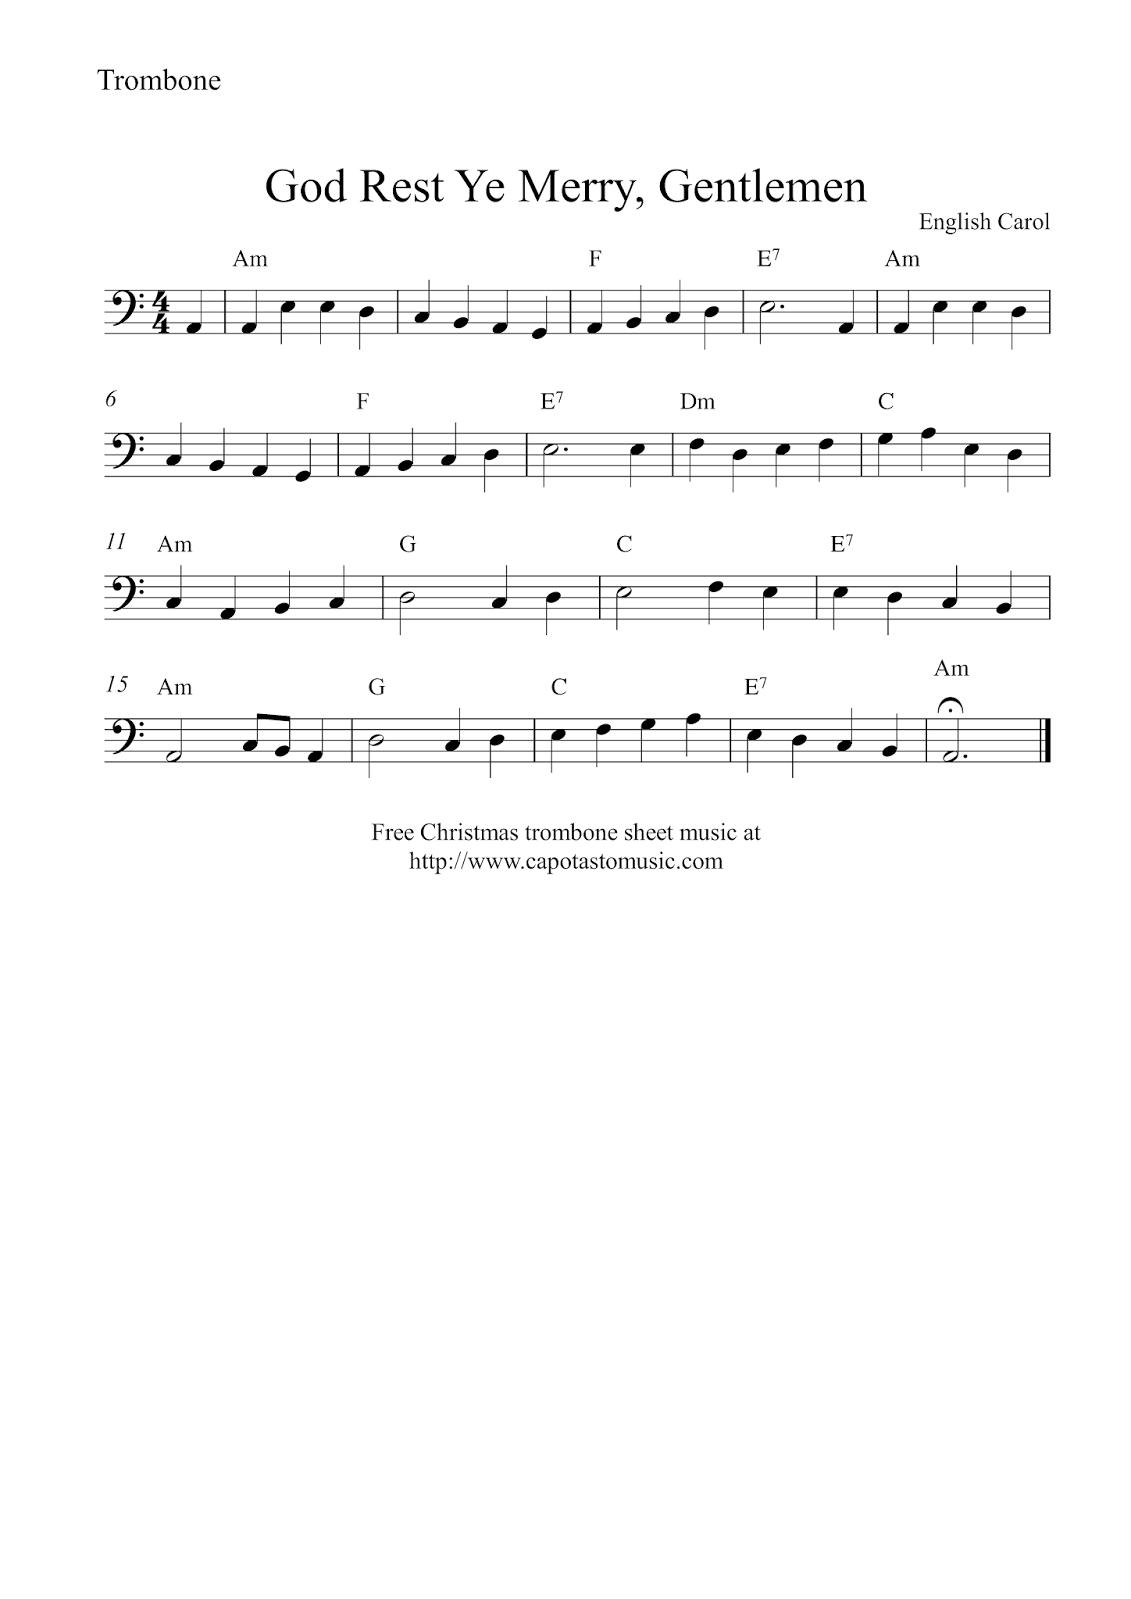 Free Easy Christmas Trombone Sheet Music - God Rest Ye Merry, Gentlemen - Trombone Christmas Sheet Music Free Printable